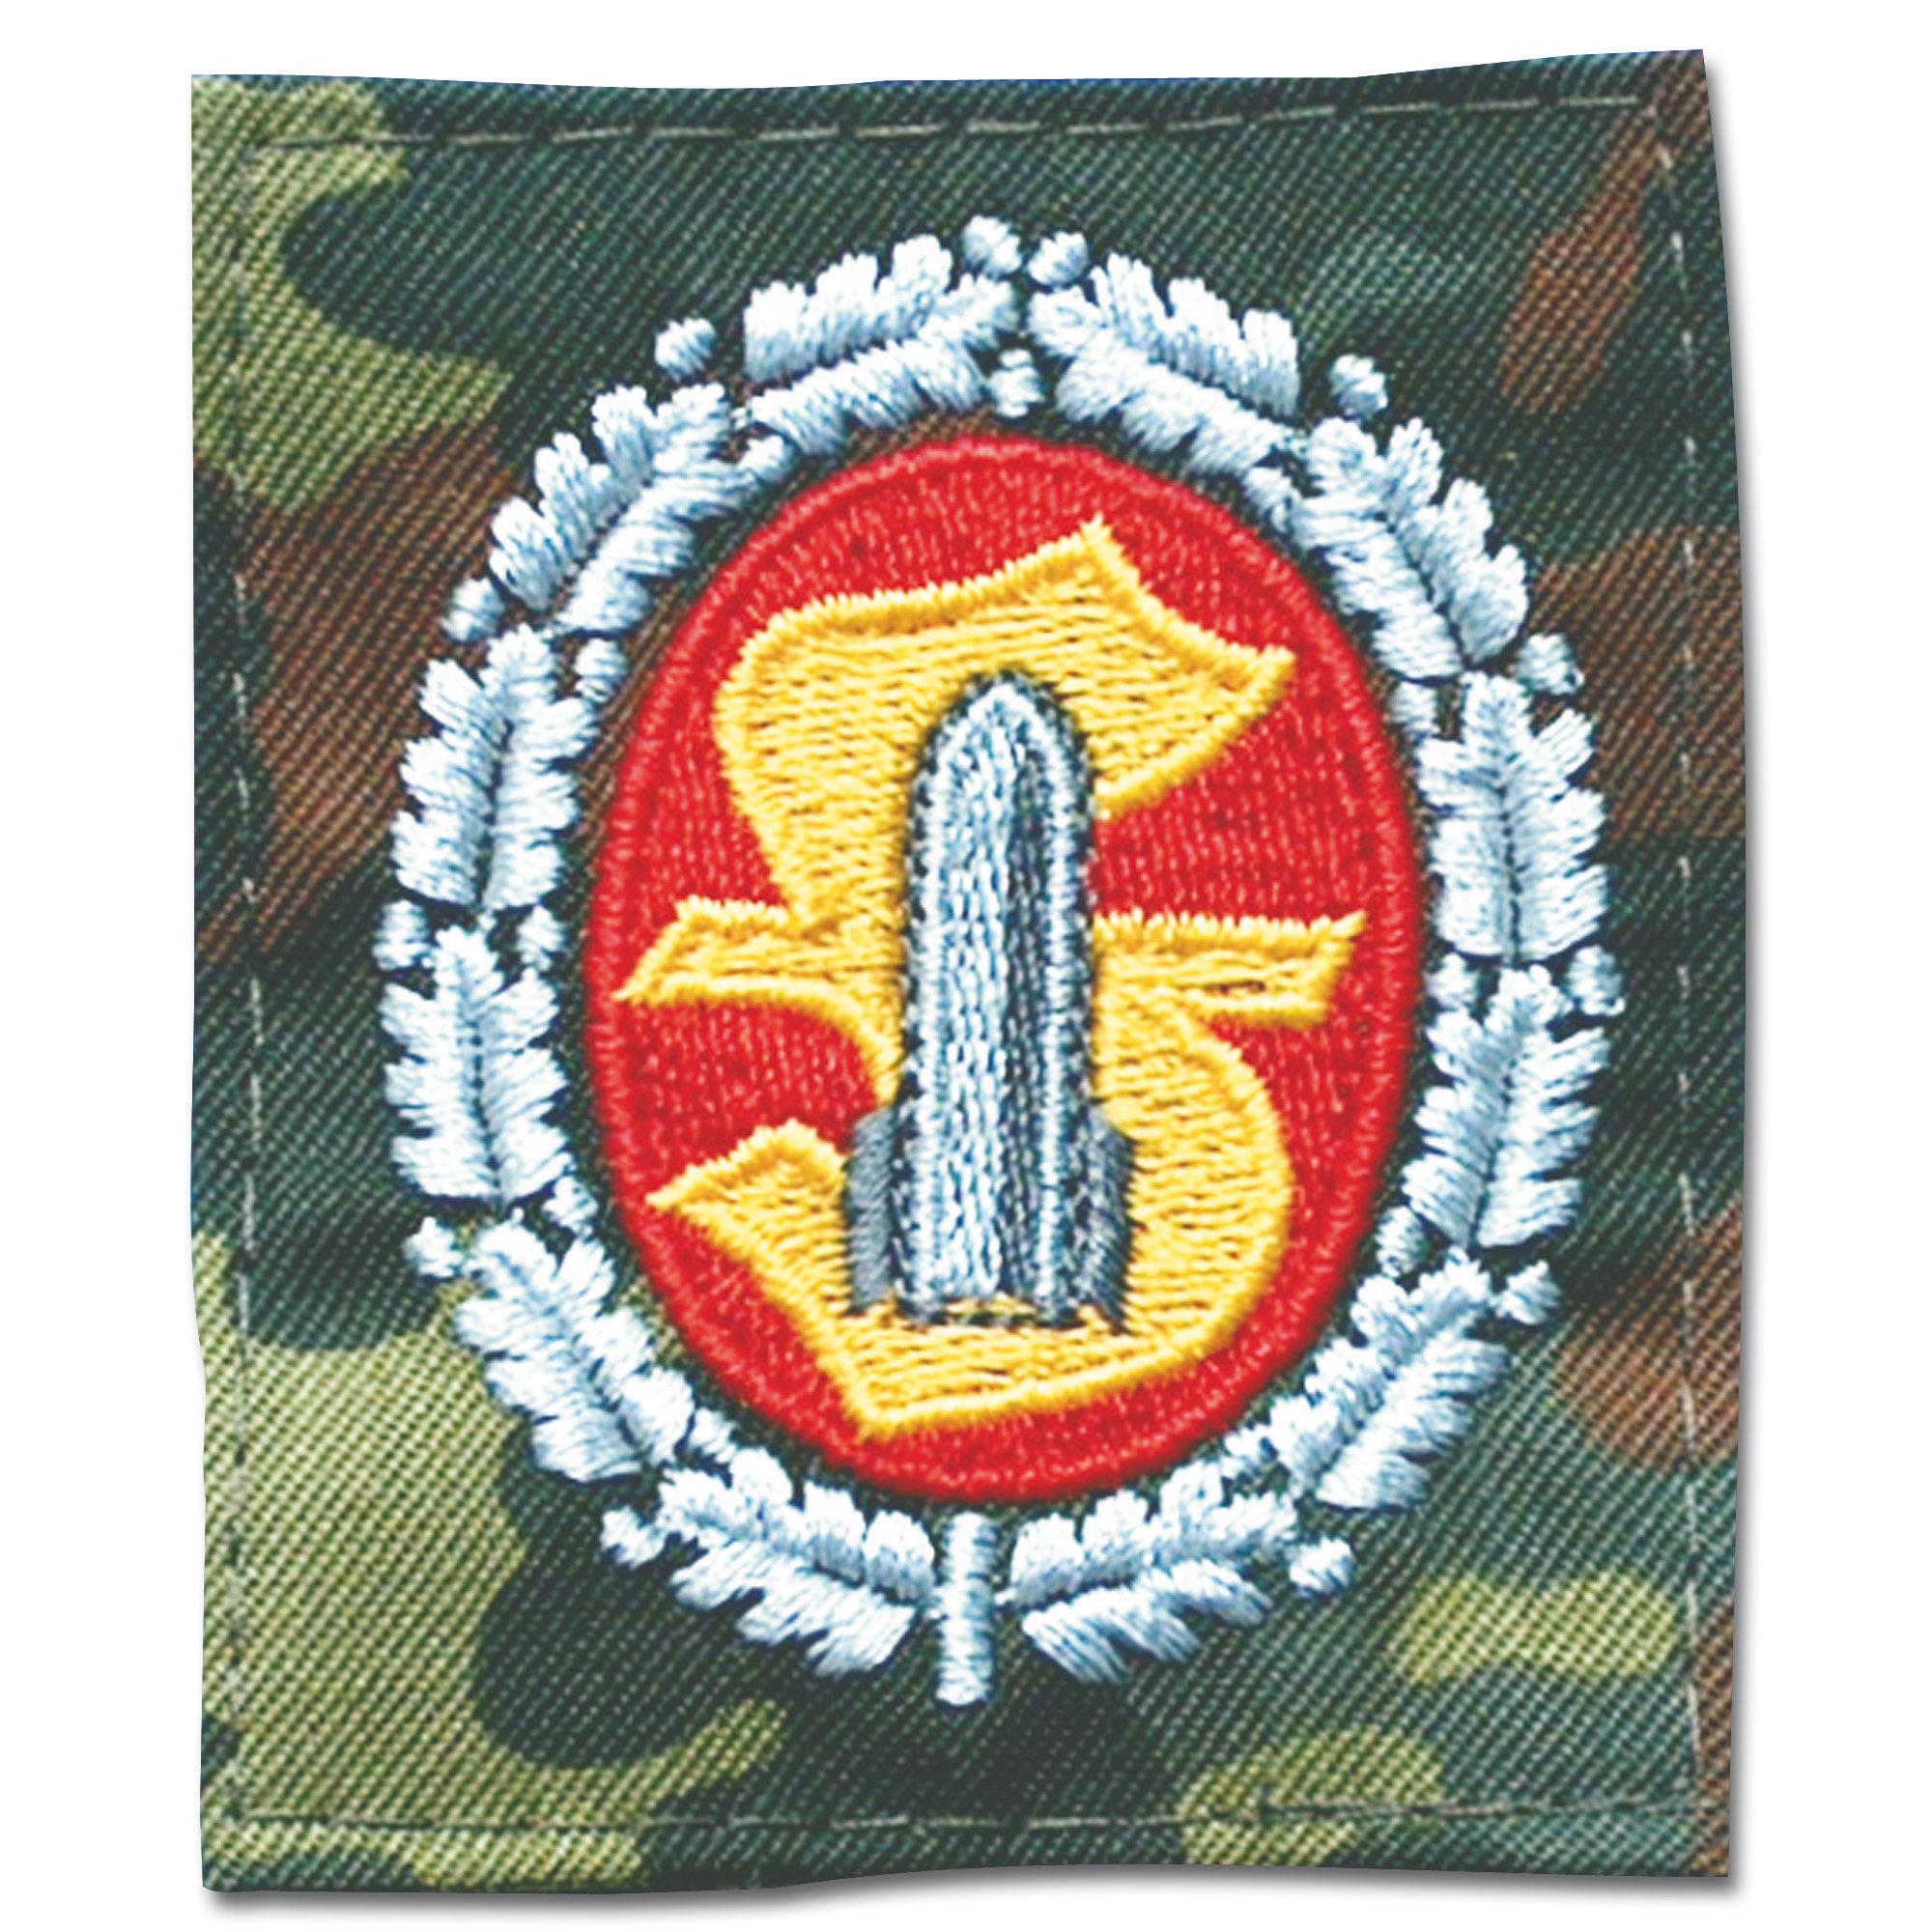 Distintivo BW Mun-Personal flecktarn/ a colores